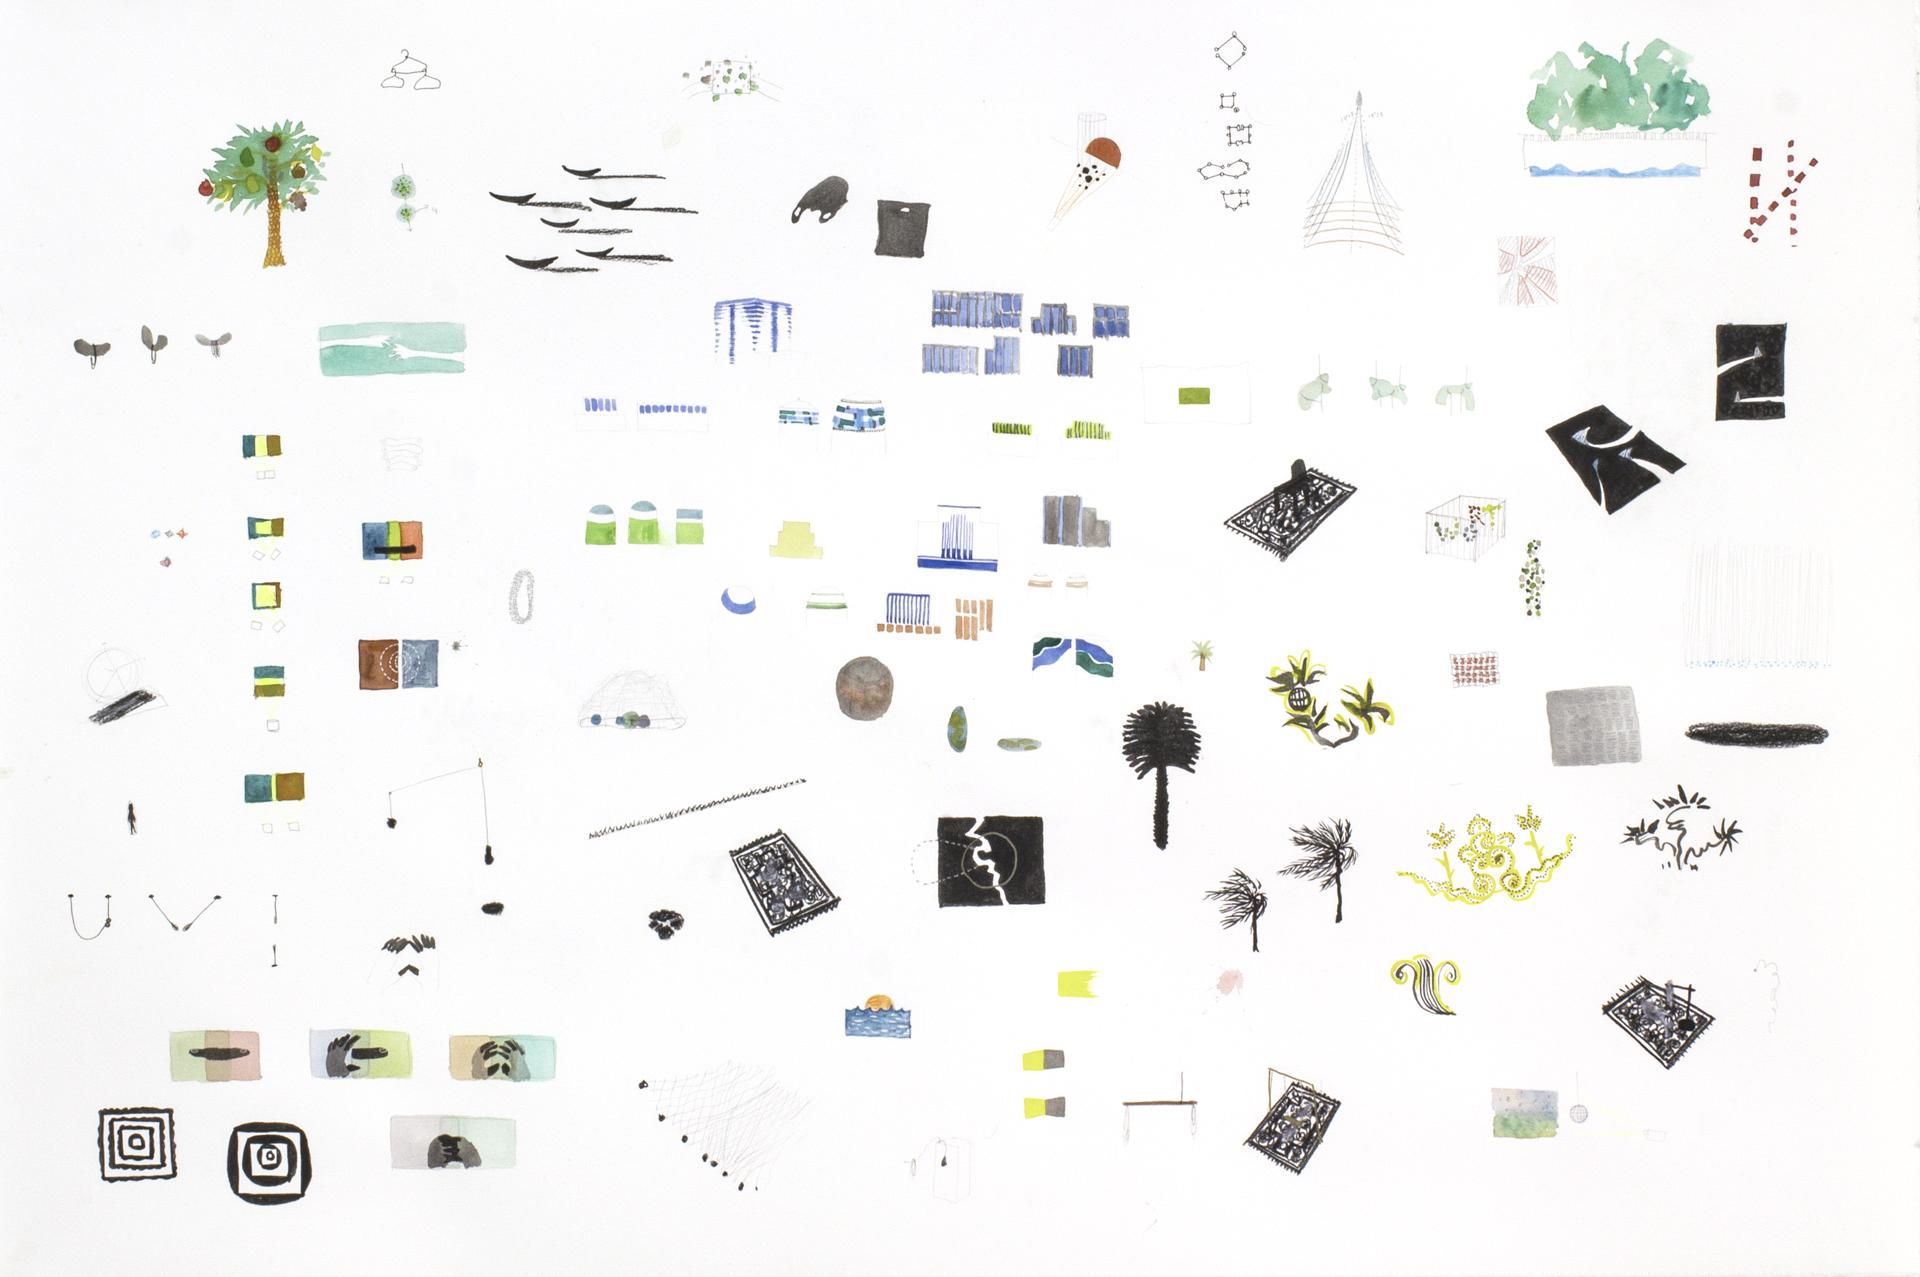 Naho Kawabe, Serie Pits(C2), 2020, Bleistift, Aquarell, Kohle auf Papier, 76 x 110 cm_1.600€